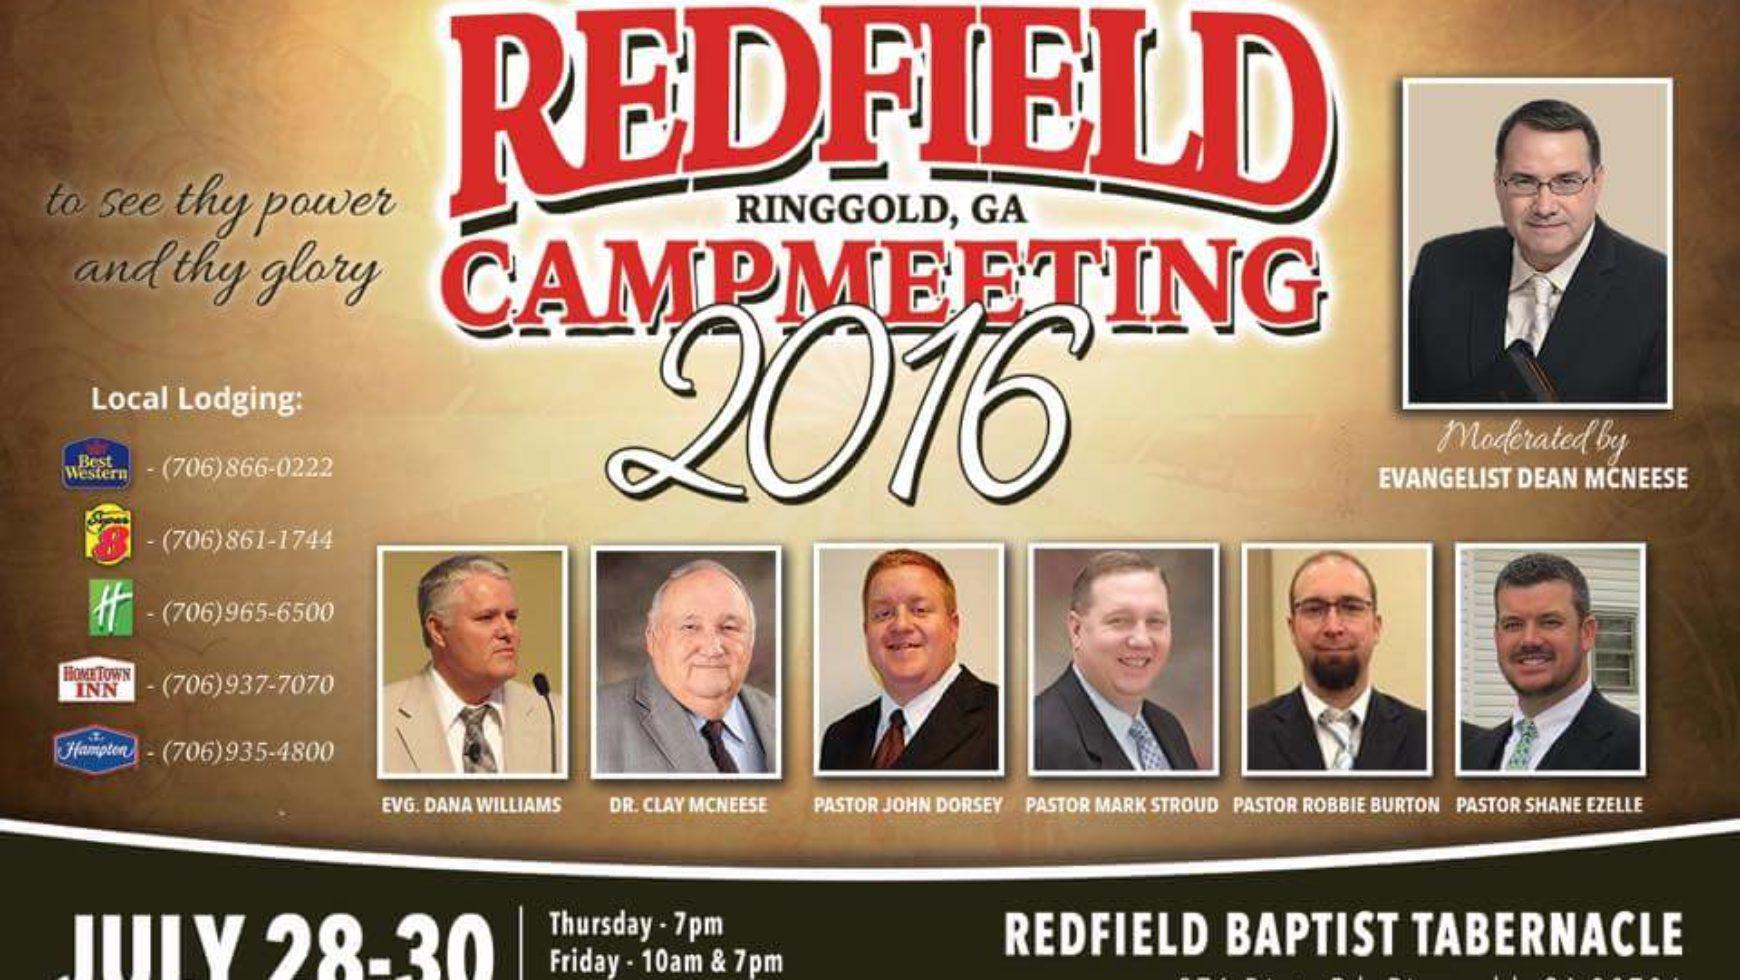 Area Meeting: Camp Meeting – Redfield Baptist Tabernacle – Ringgold, GA